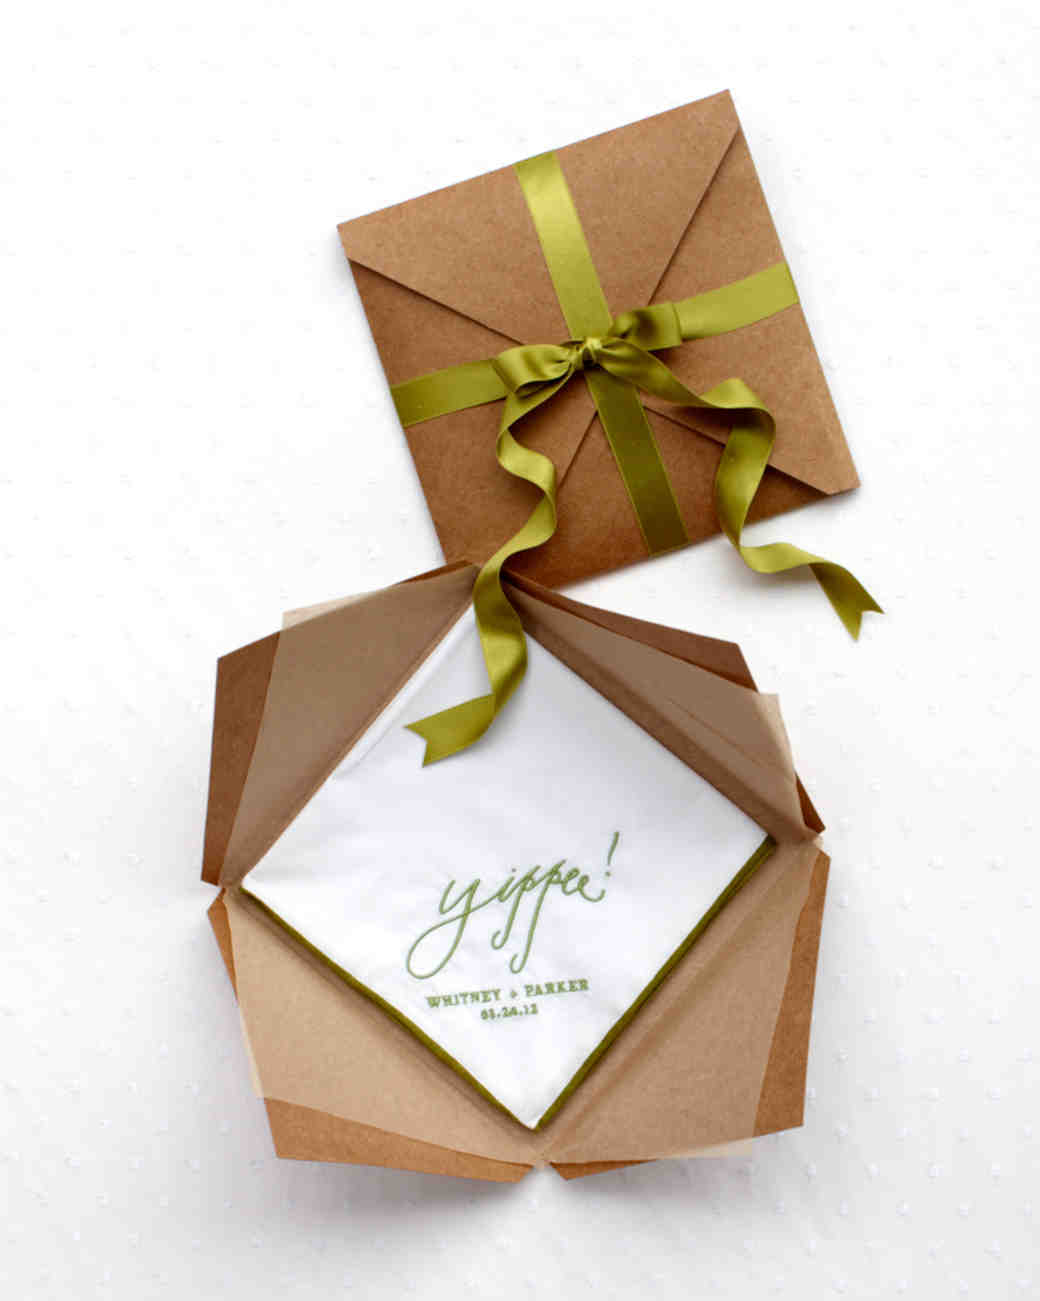 Handkerchief Keepsakes Boxed Wedding Favors Martha